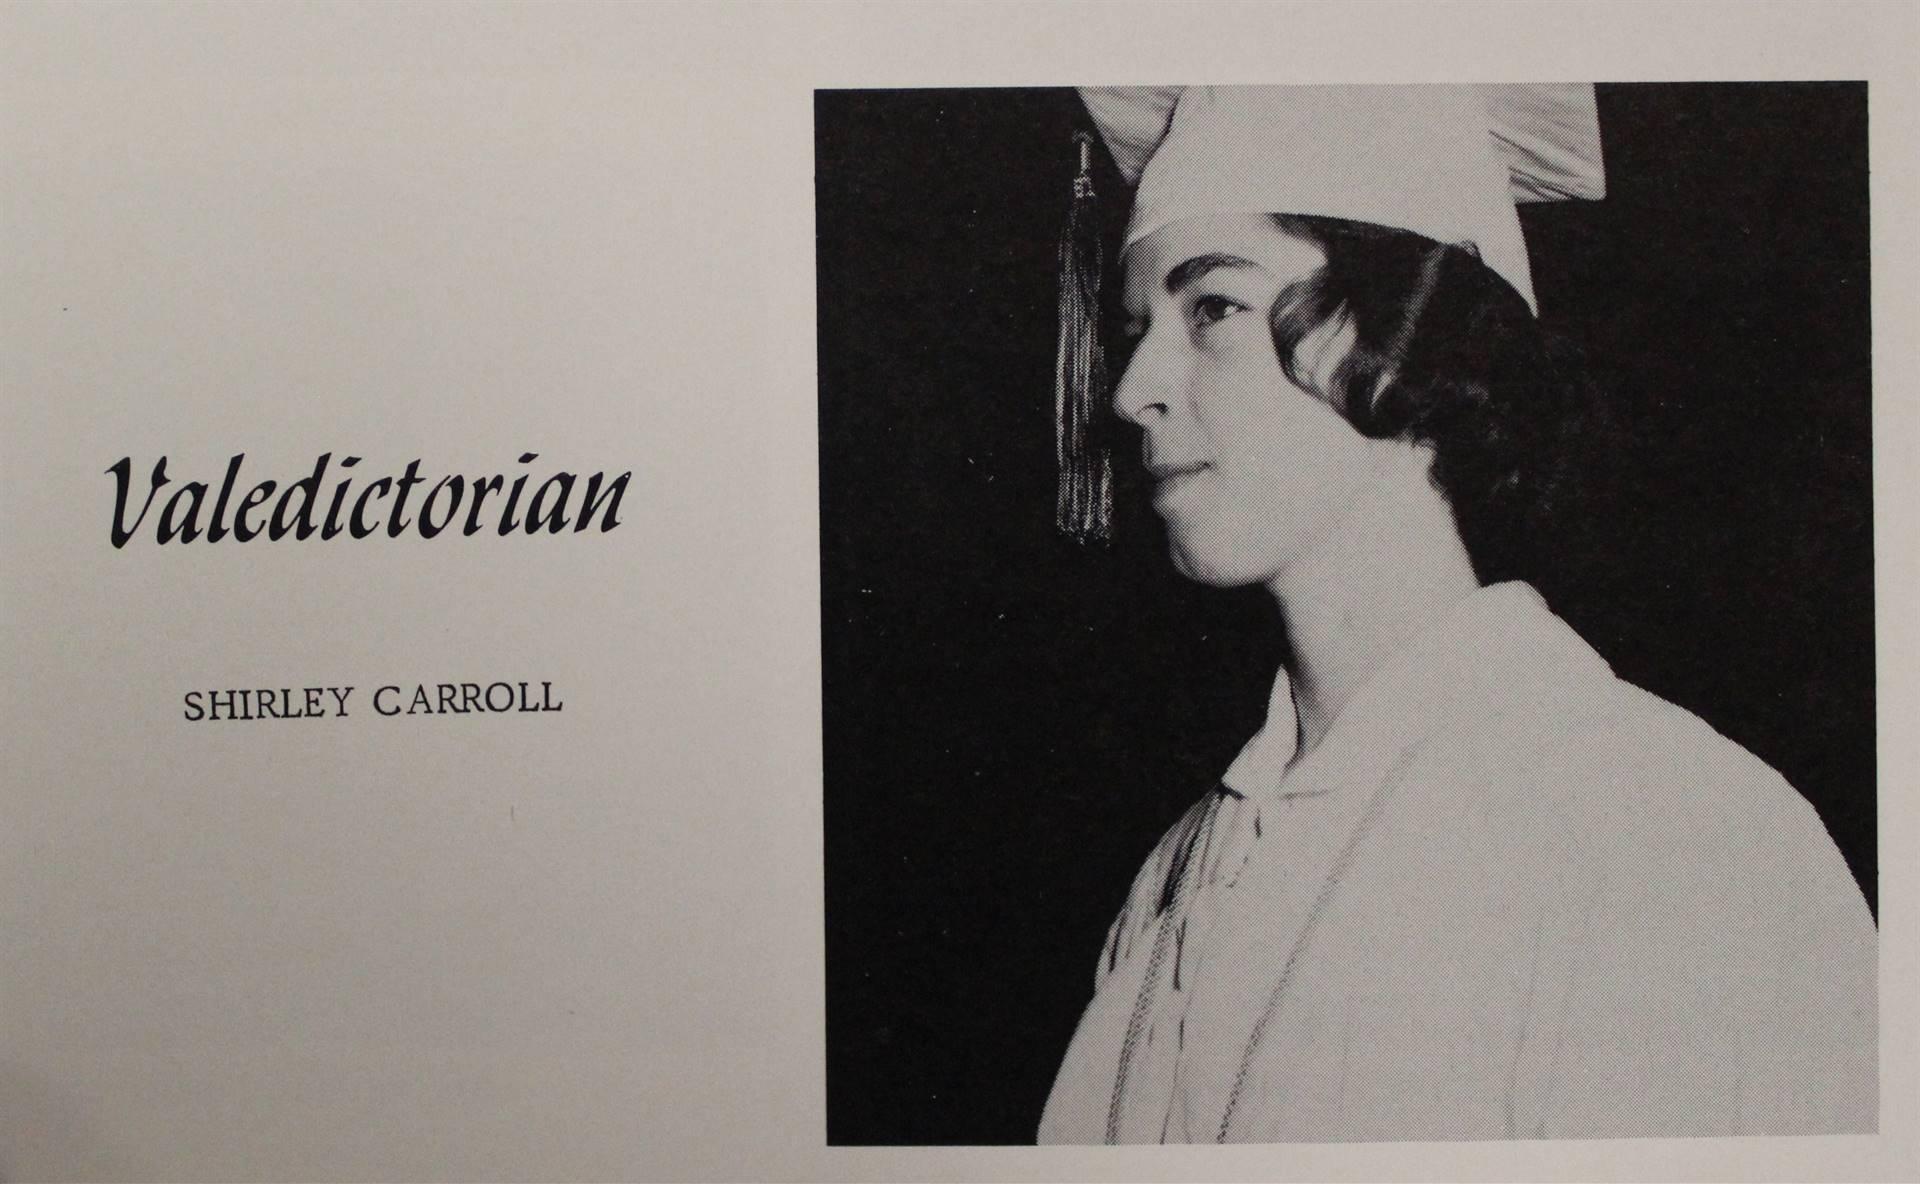 1961 Valedictorian